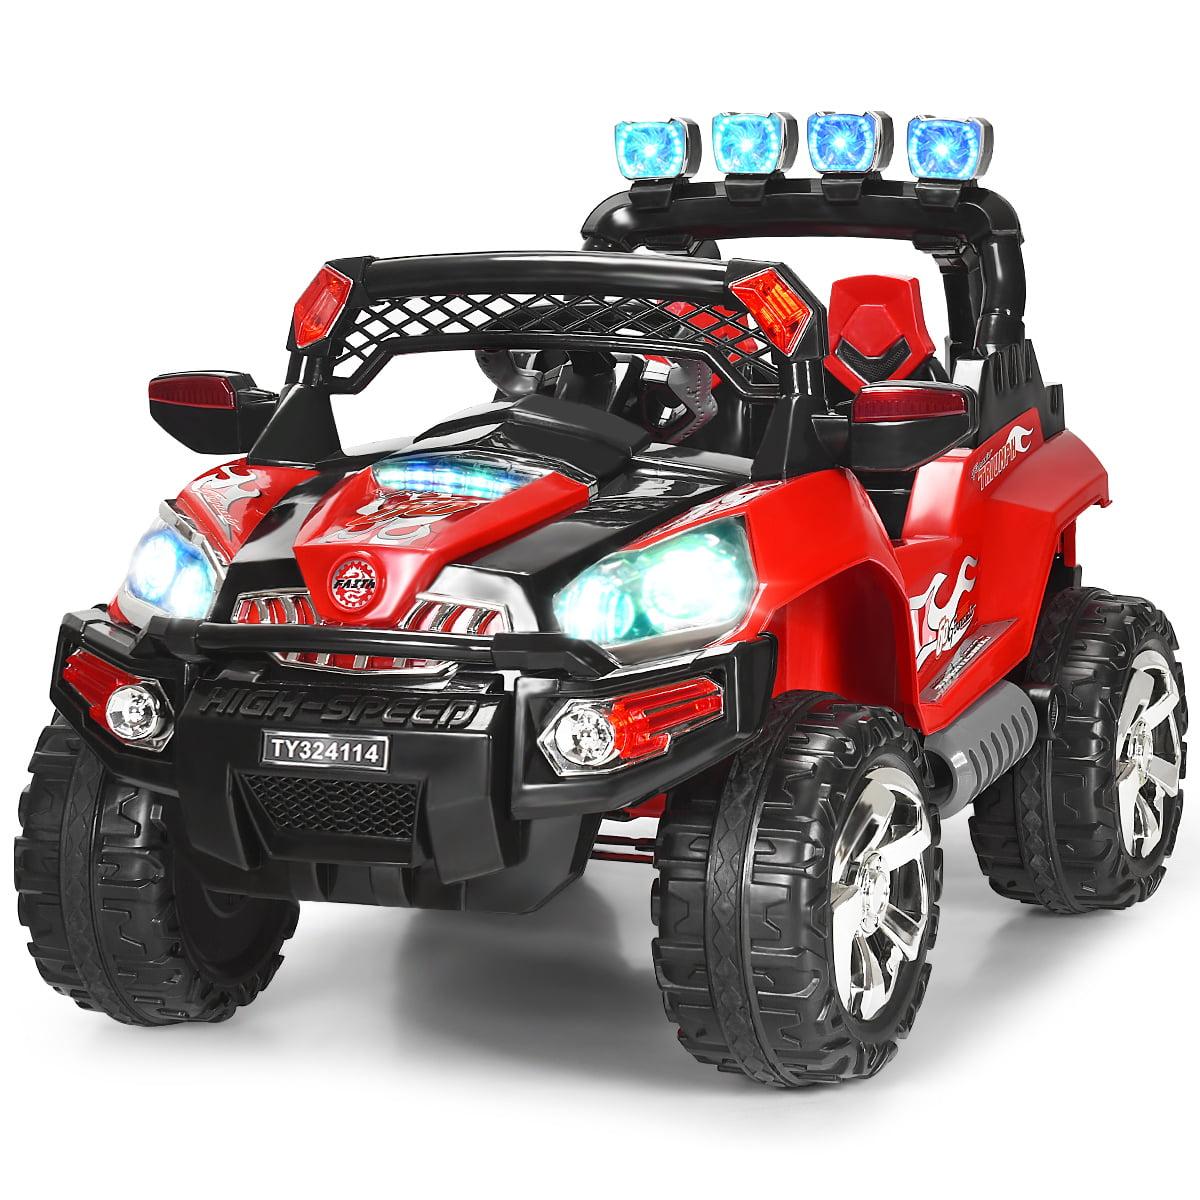 12v Kids Ride On Truck Car Suv Mp3 Rc Remote Control W Led Lights Music Walmart Com Walmart Com